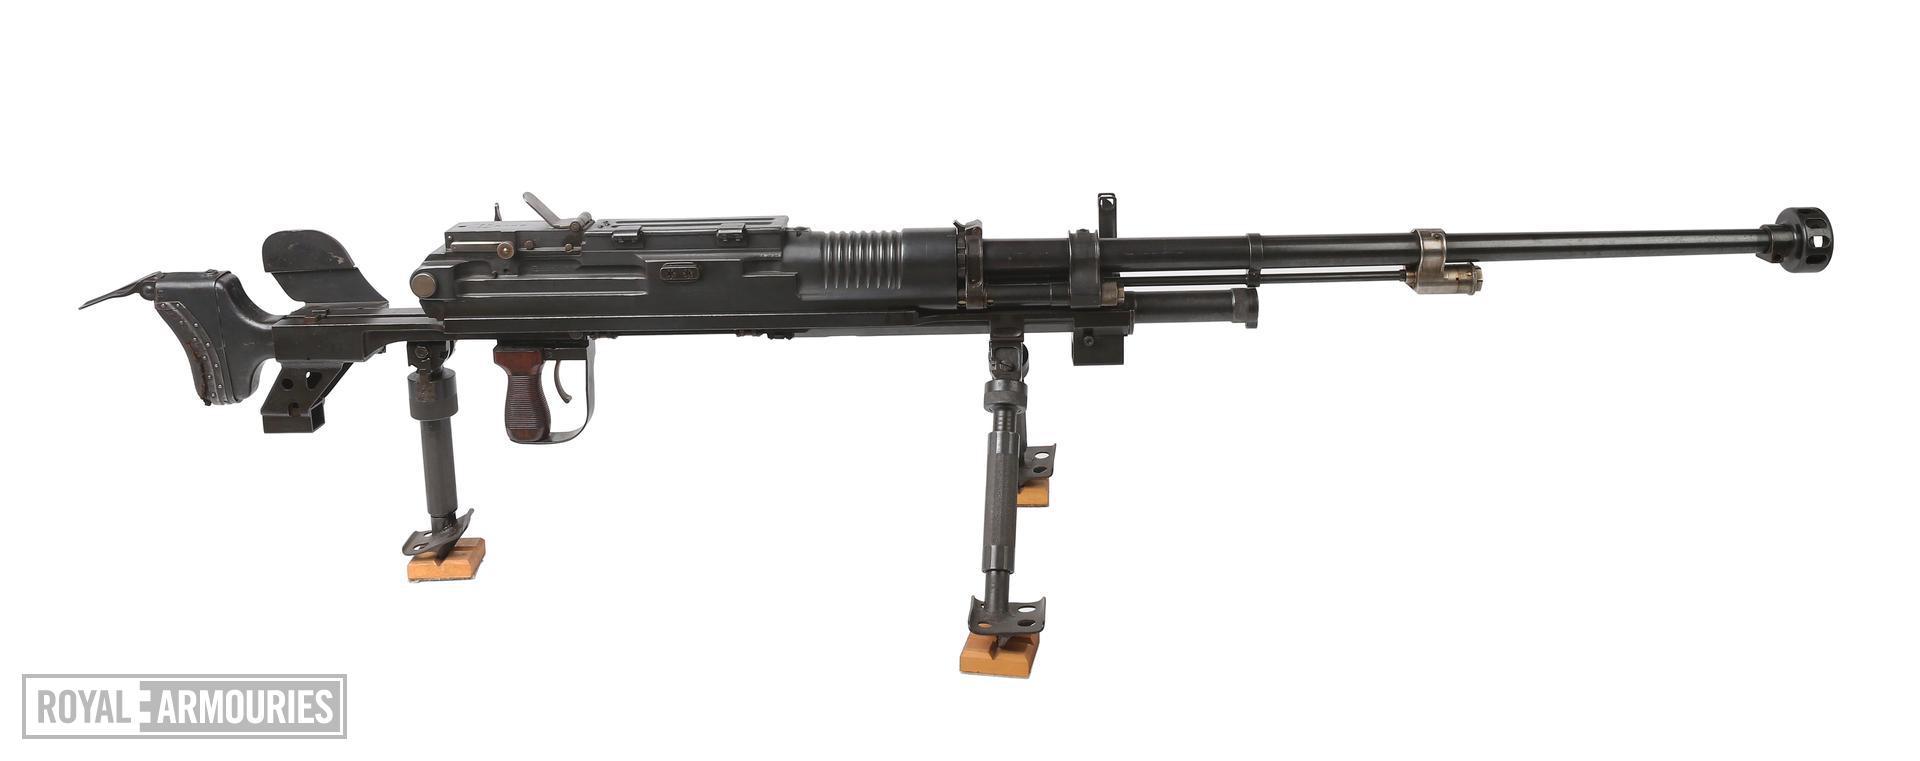 Centrefire automatic rifle - Type 97